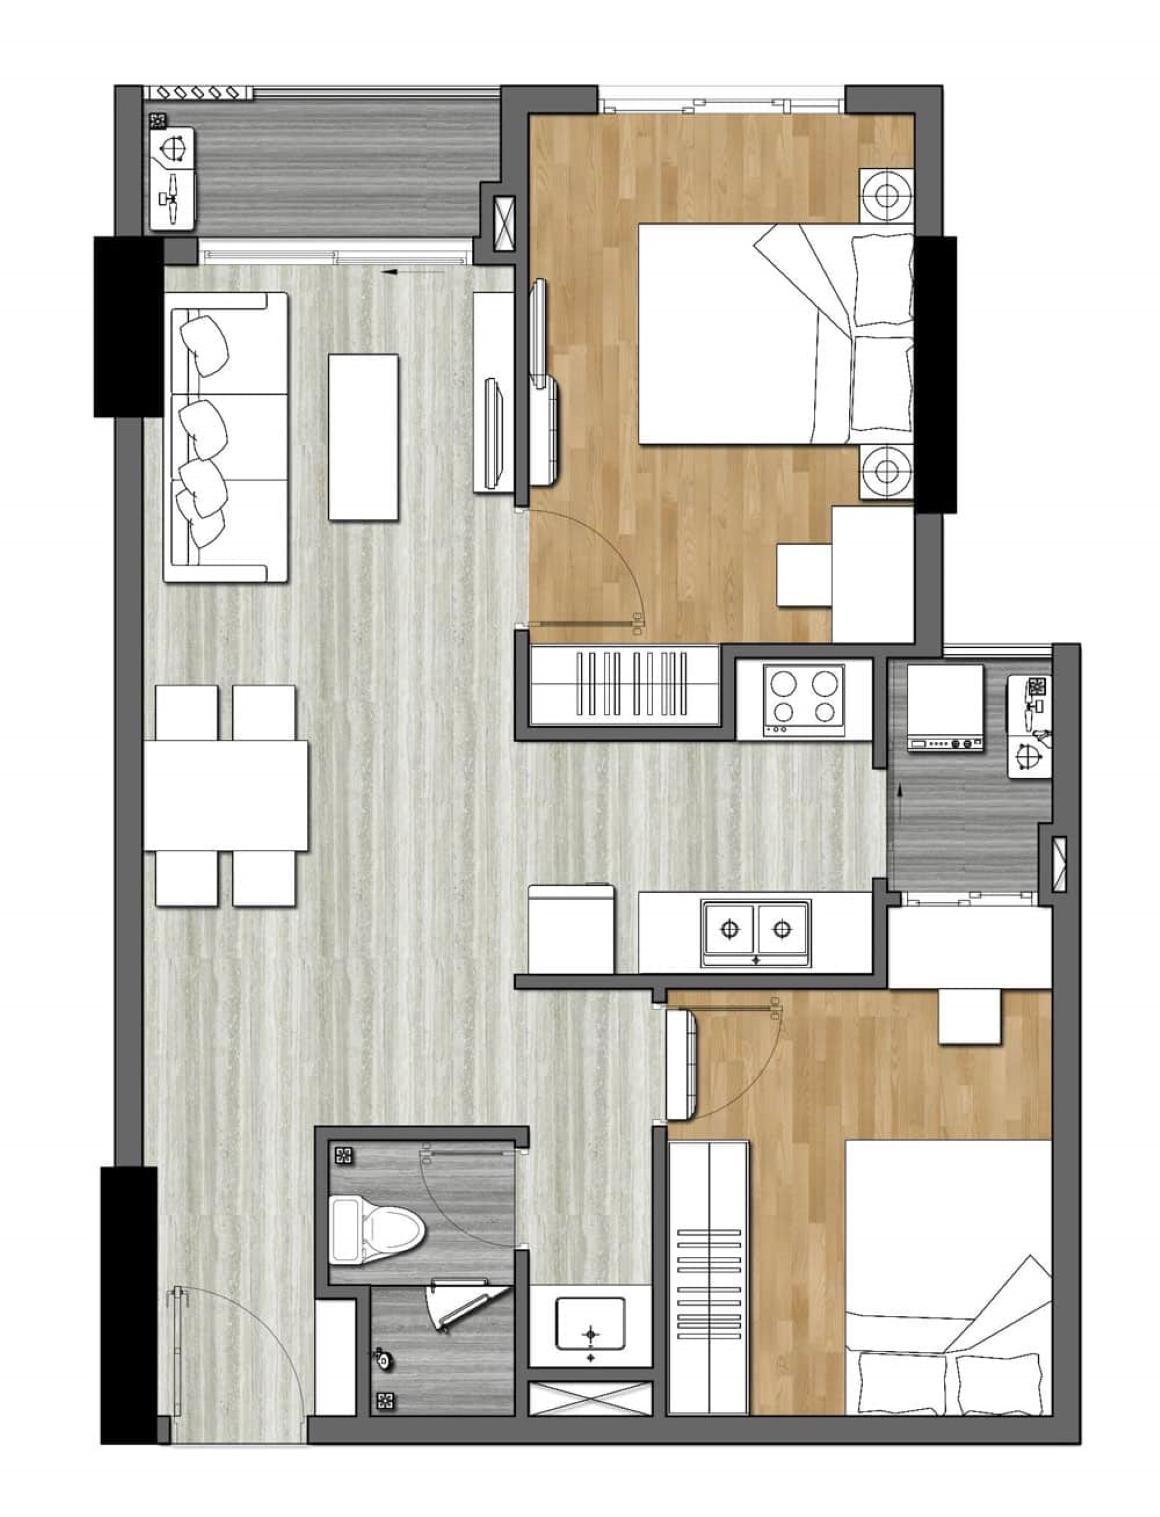 Thiết kế căn hộ New Galaxy - 2PN